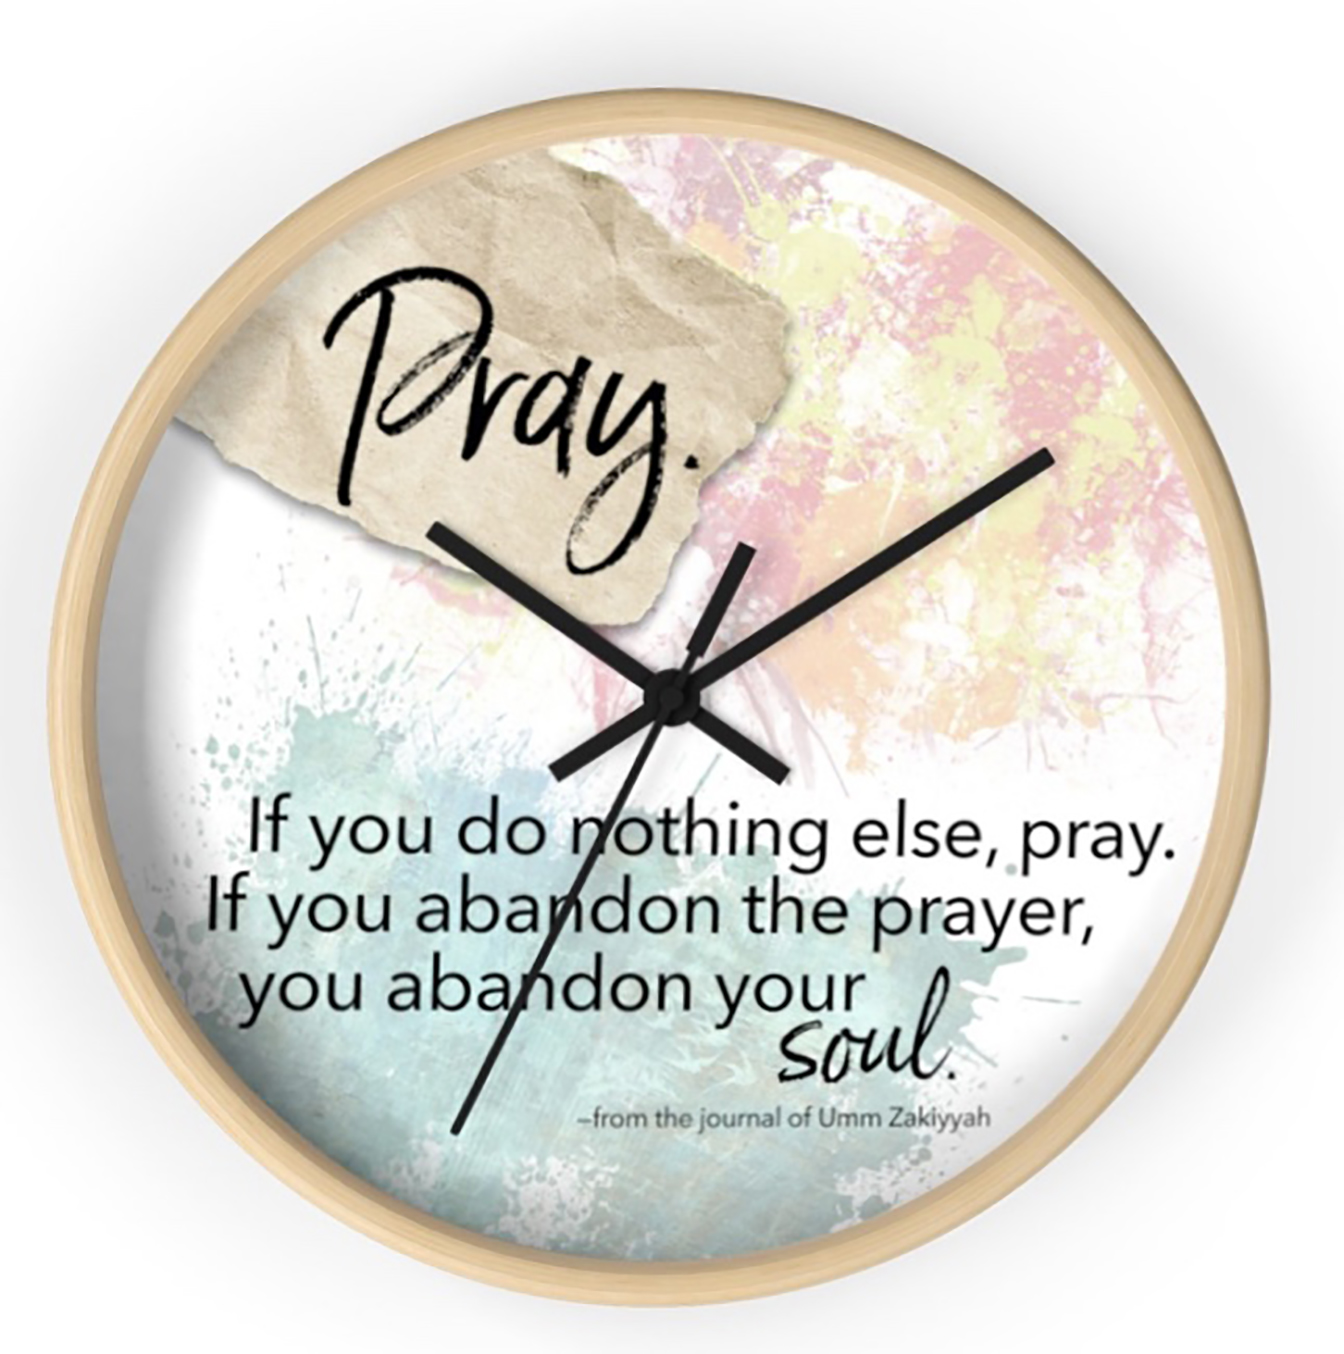 Pray clock screenshot (from uzsoulgear.com)